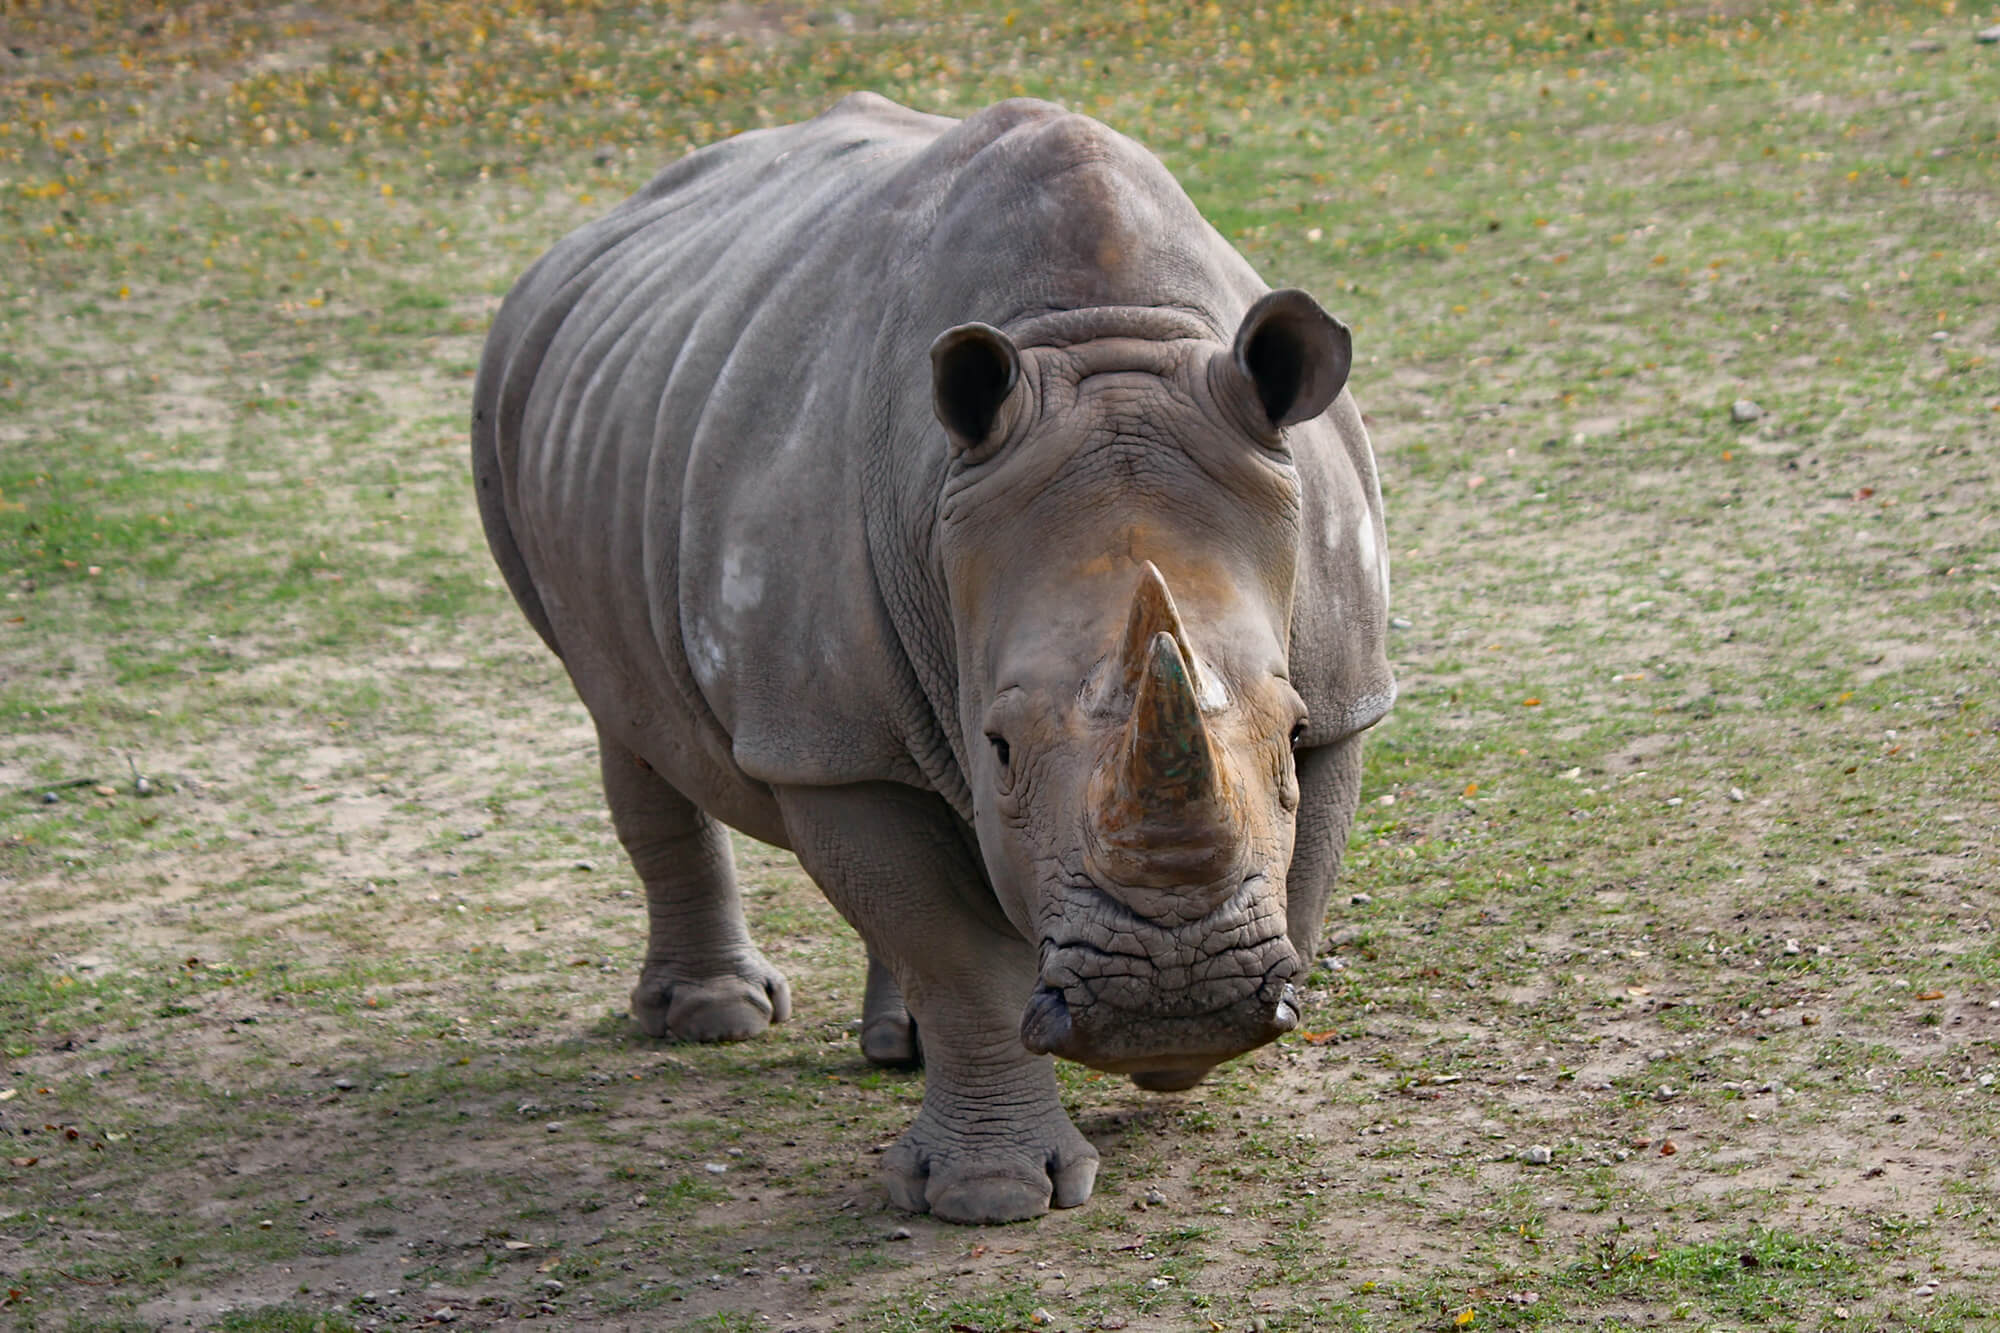 Rhino walking over grass